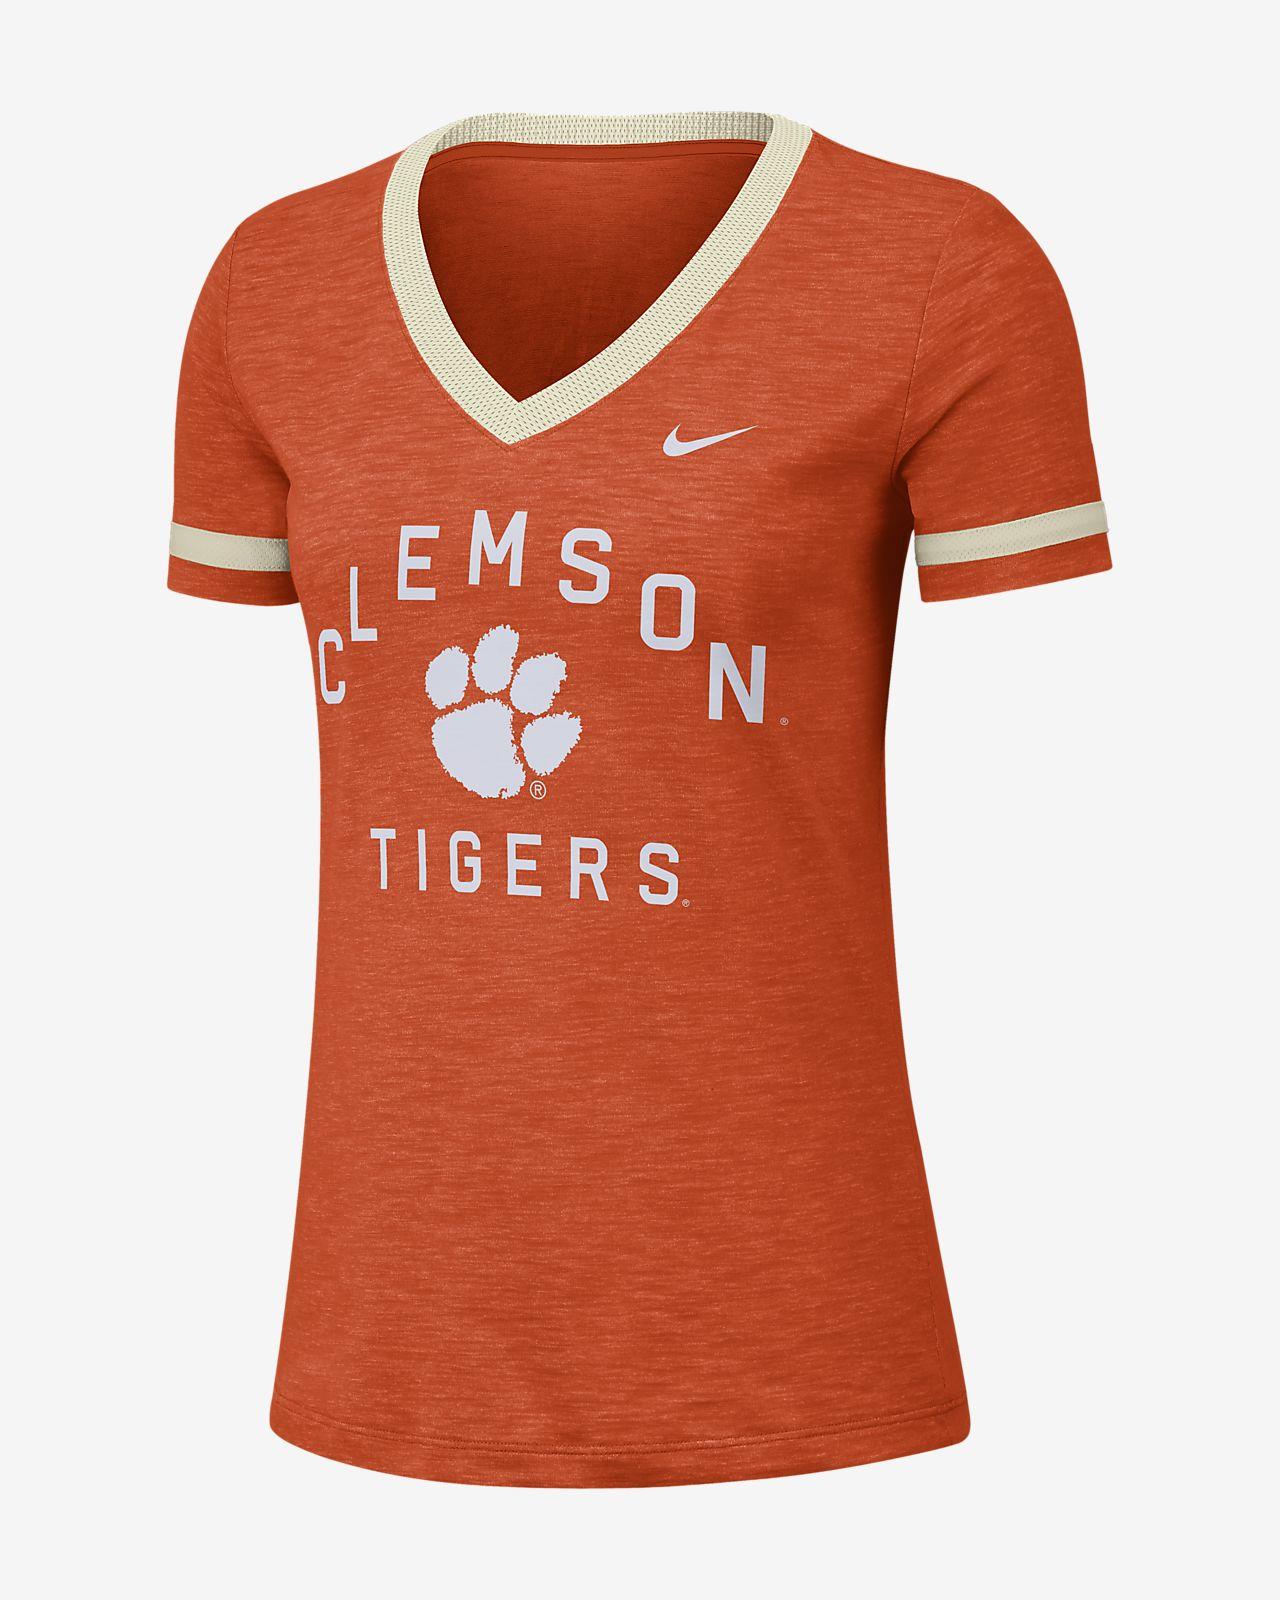 Nike College Dri-FIT Fan (Clemson) Women's Short-Sleeve V-Neck Top